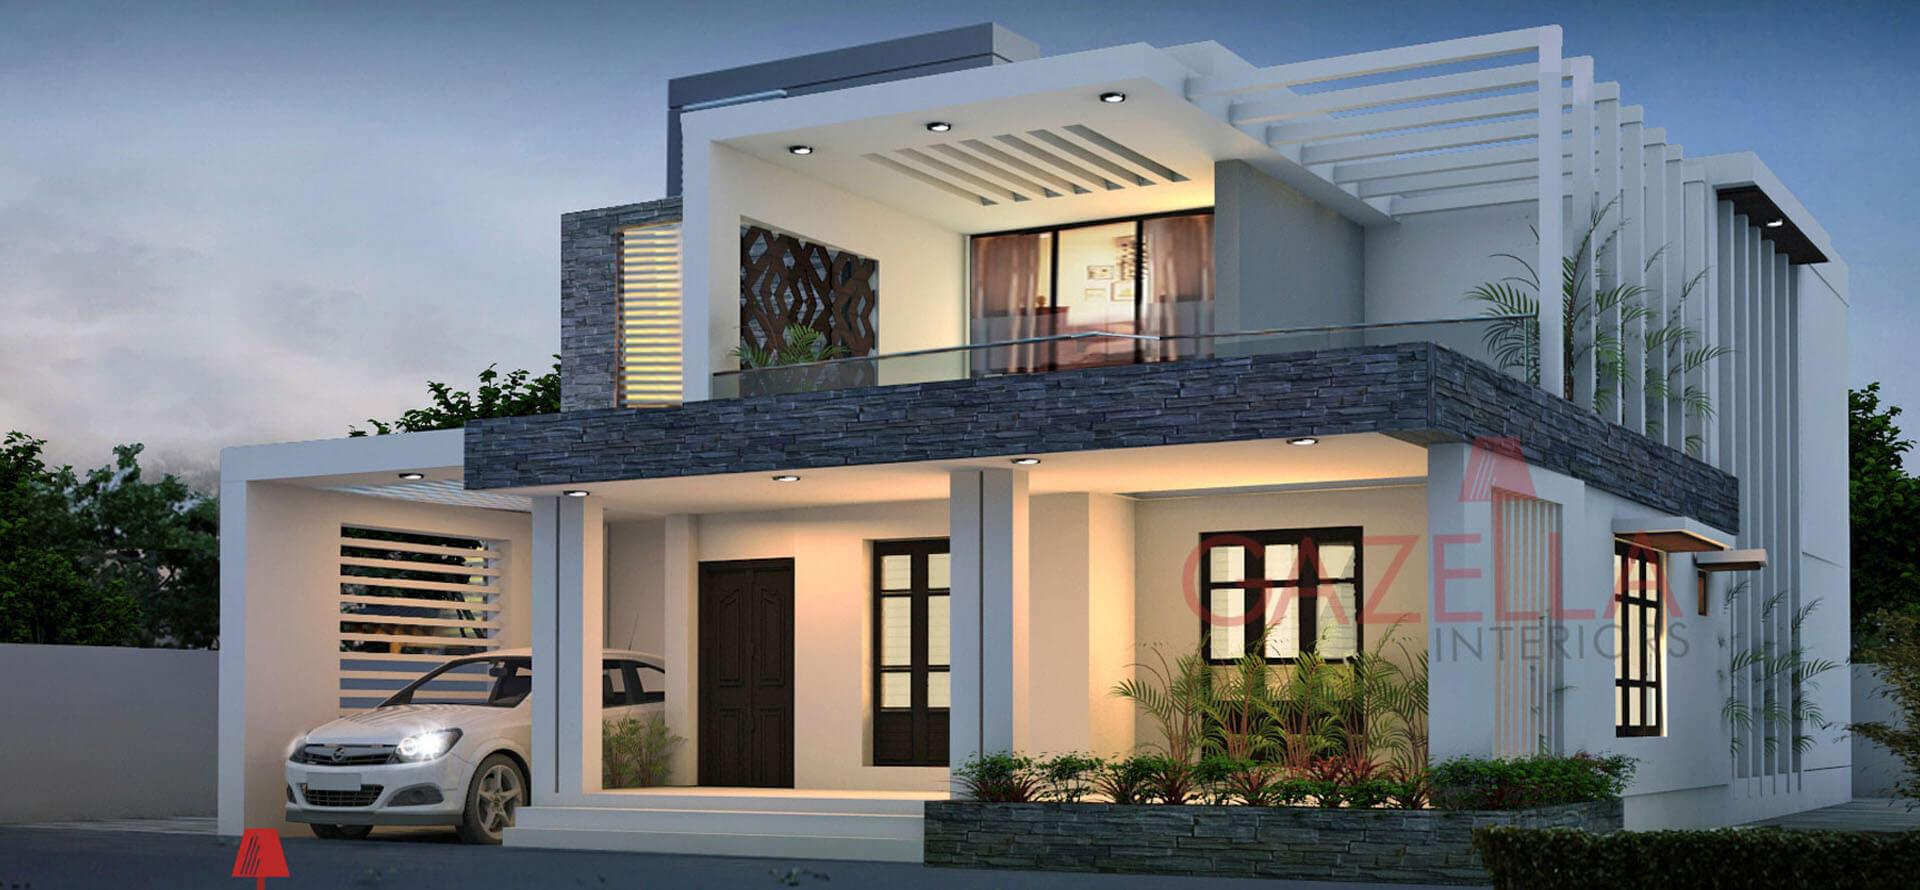 Interior Designers In Trivandrum For Homes Offices Gazella